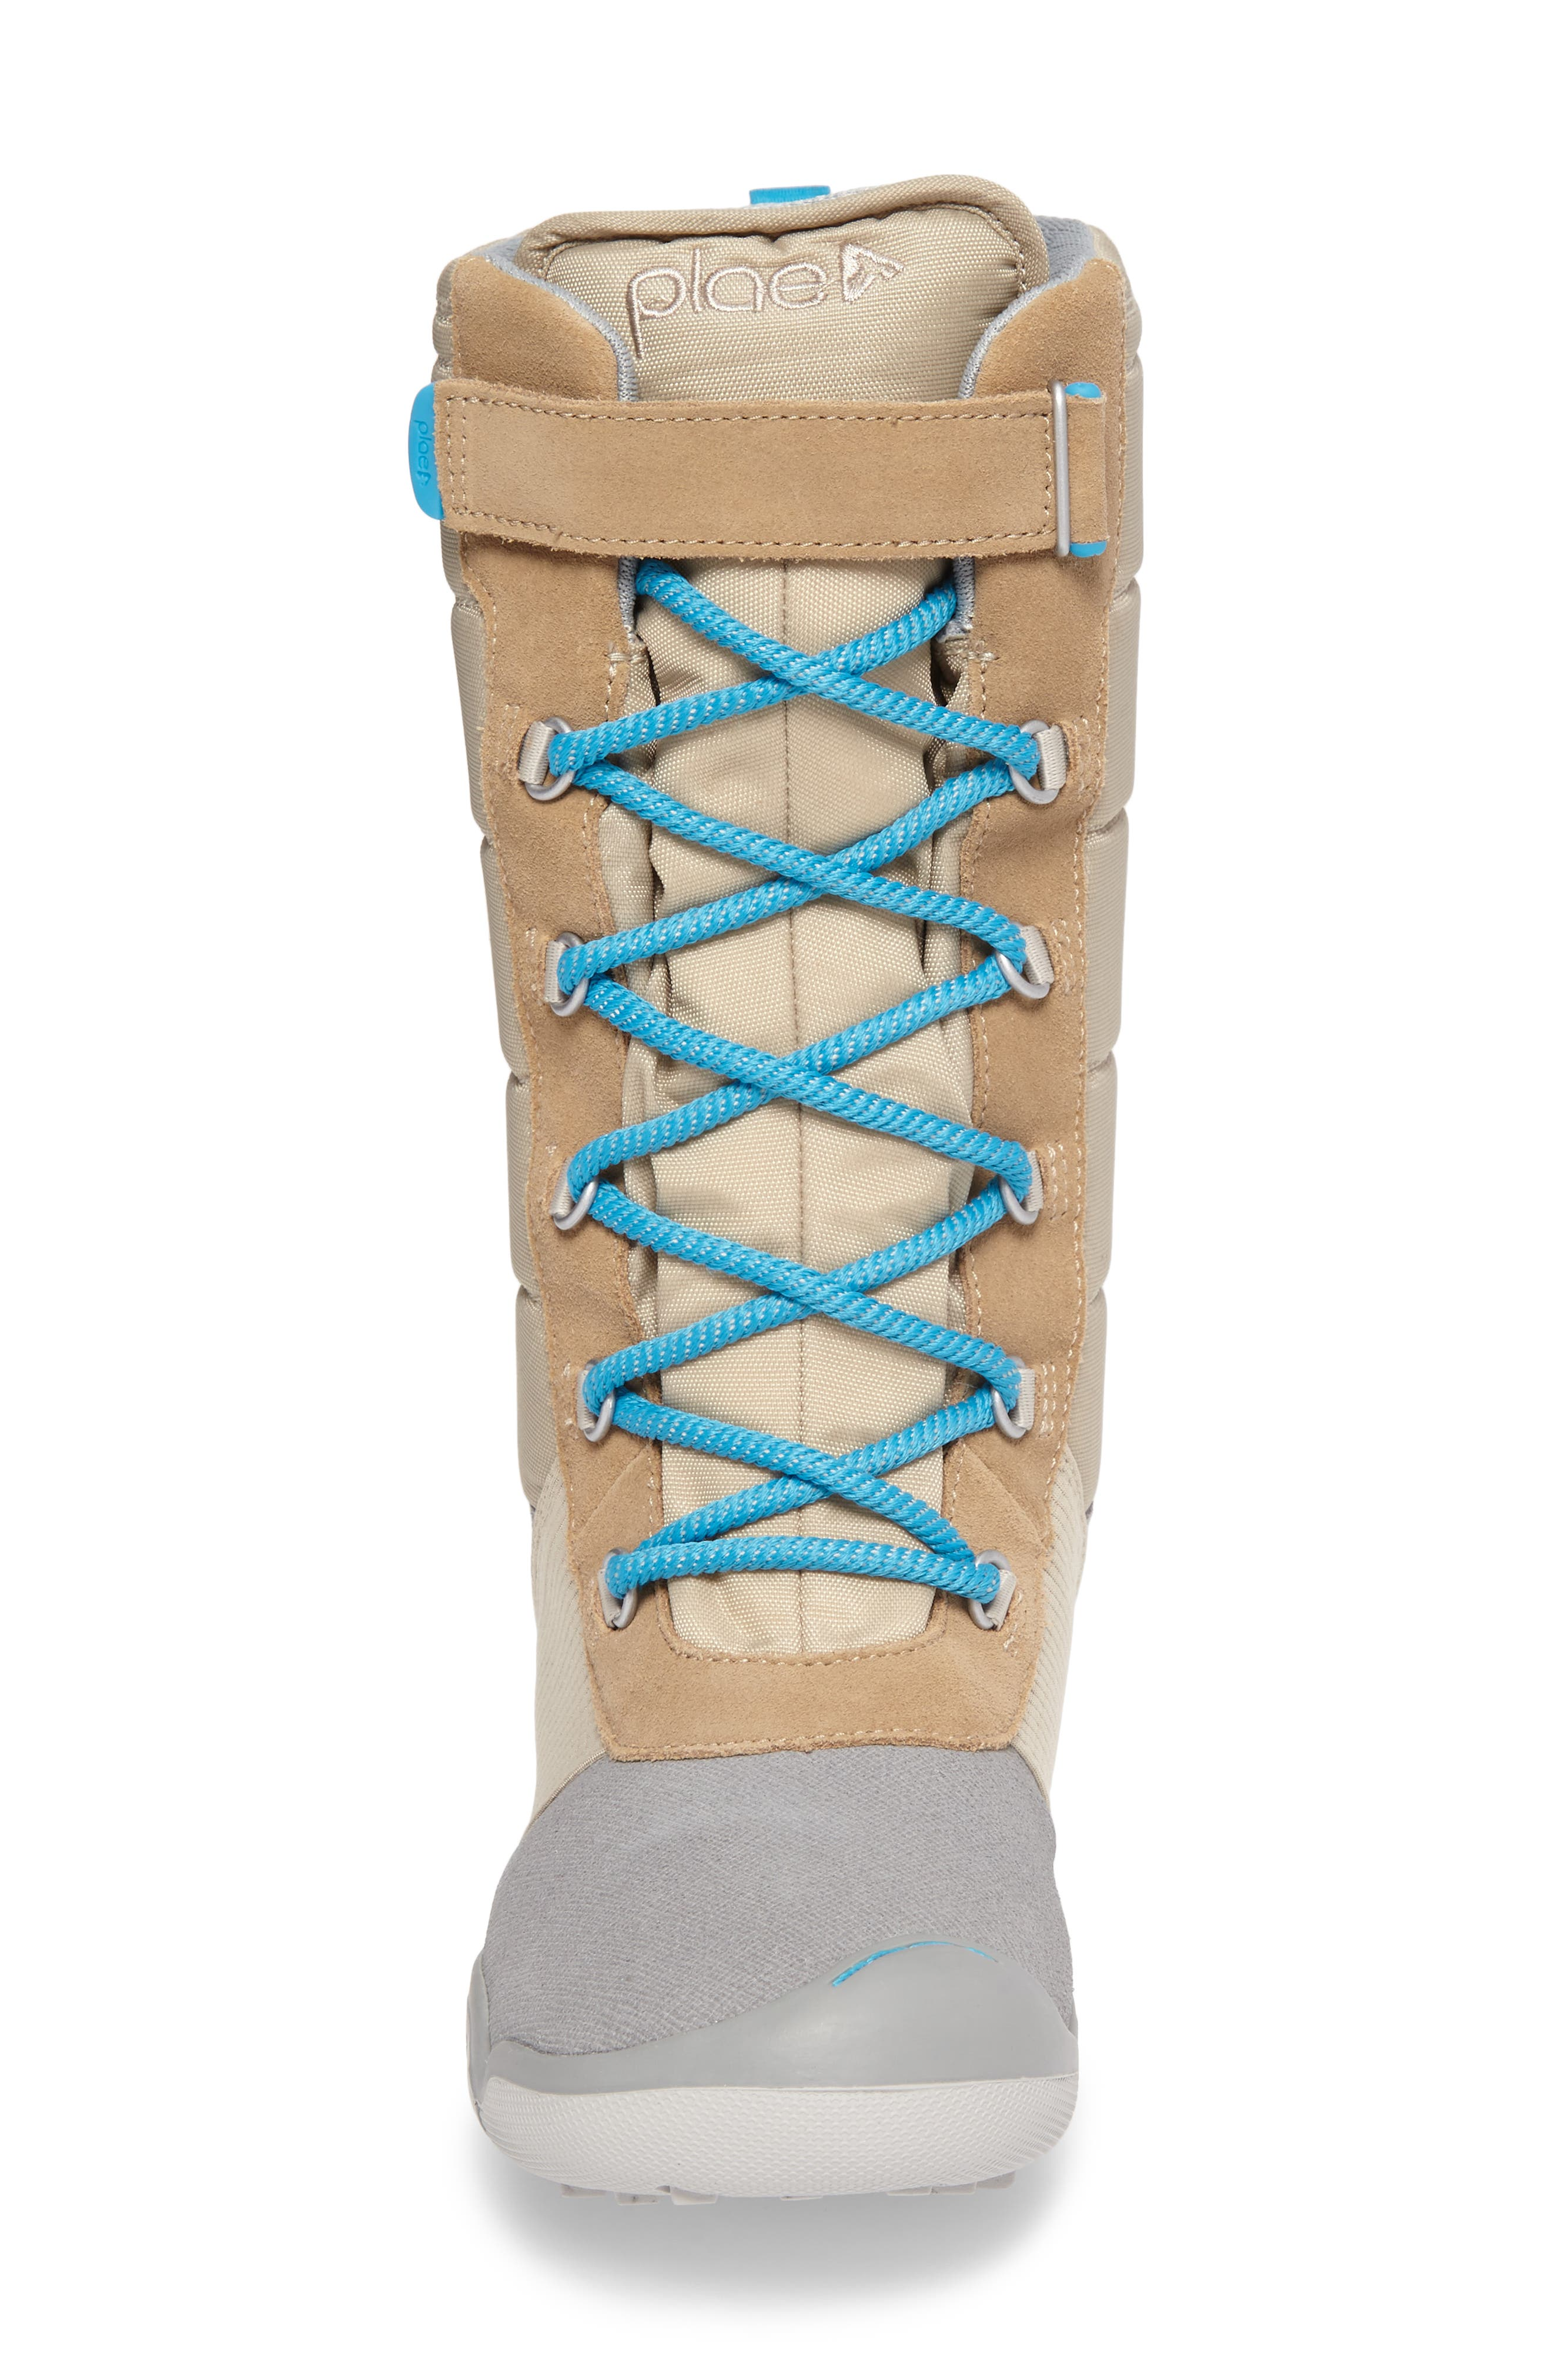 Jack Customizable Waterproof Boot,                             Alternate thumbnail 4, color,                             Light